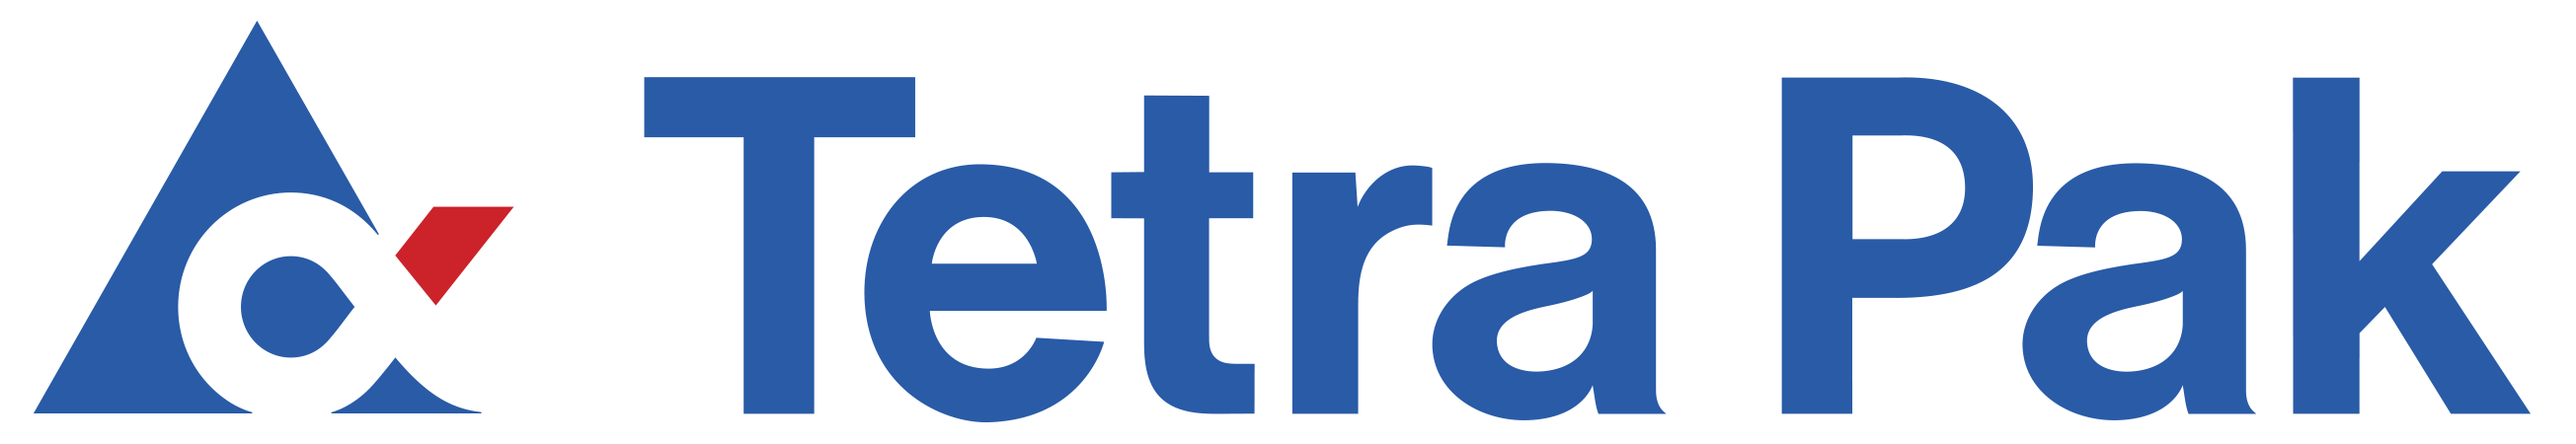 Tetra_Pak_Logo